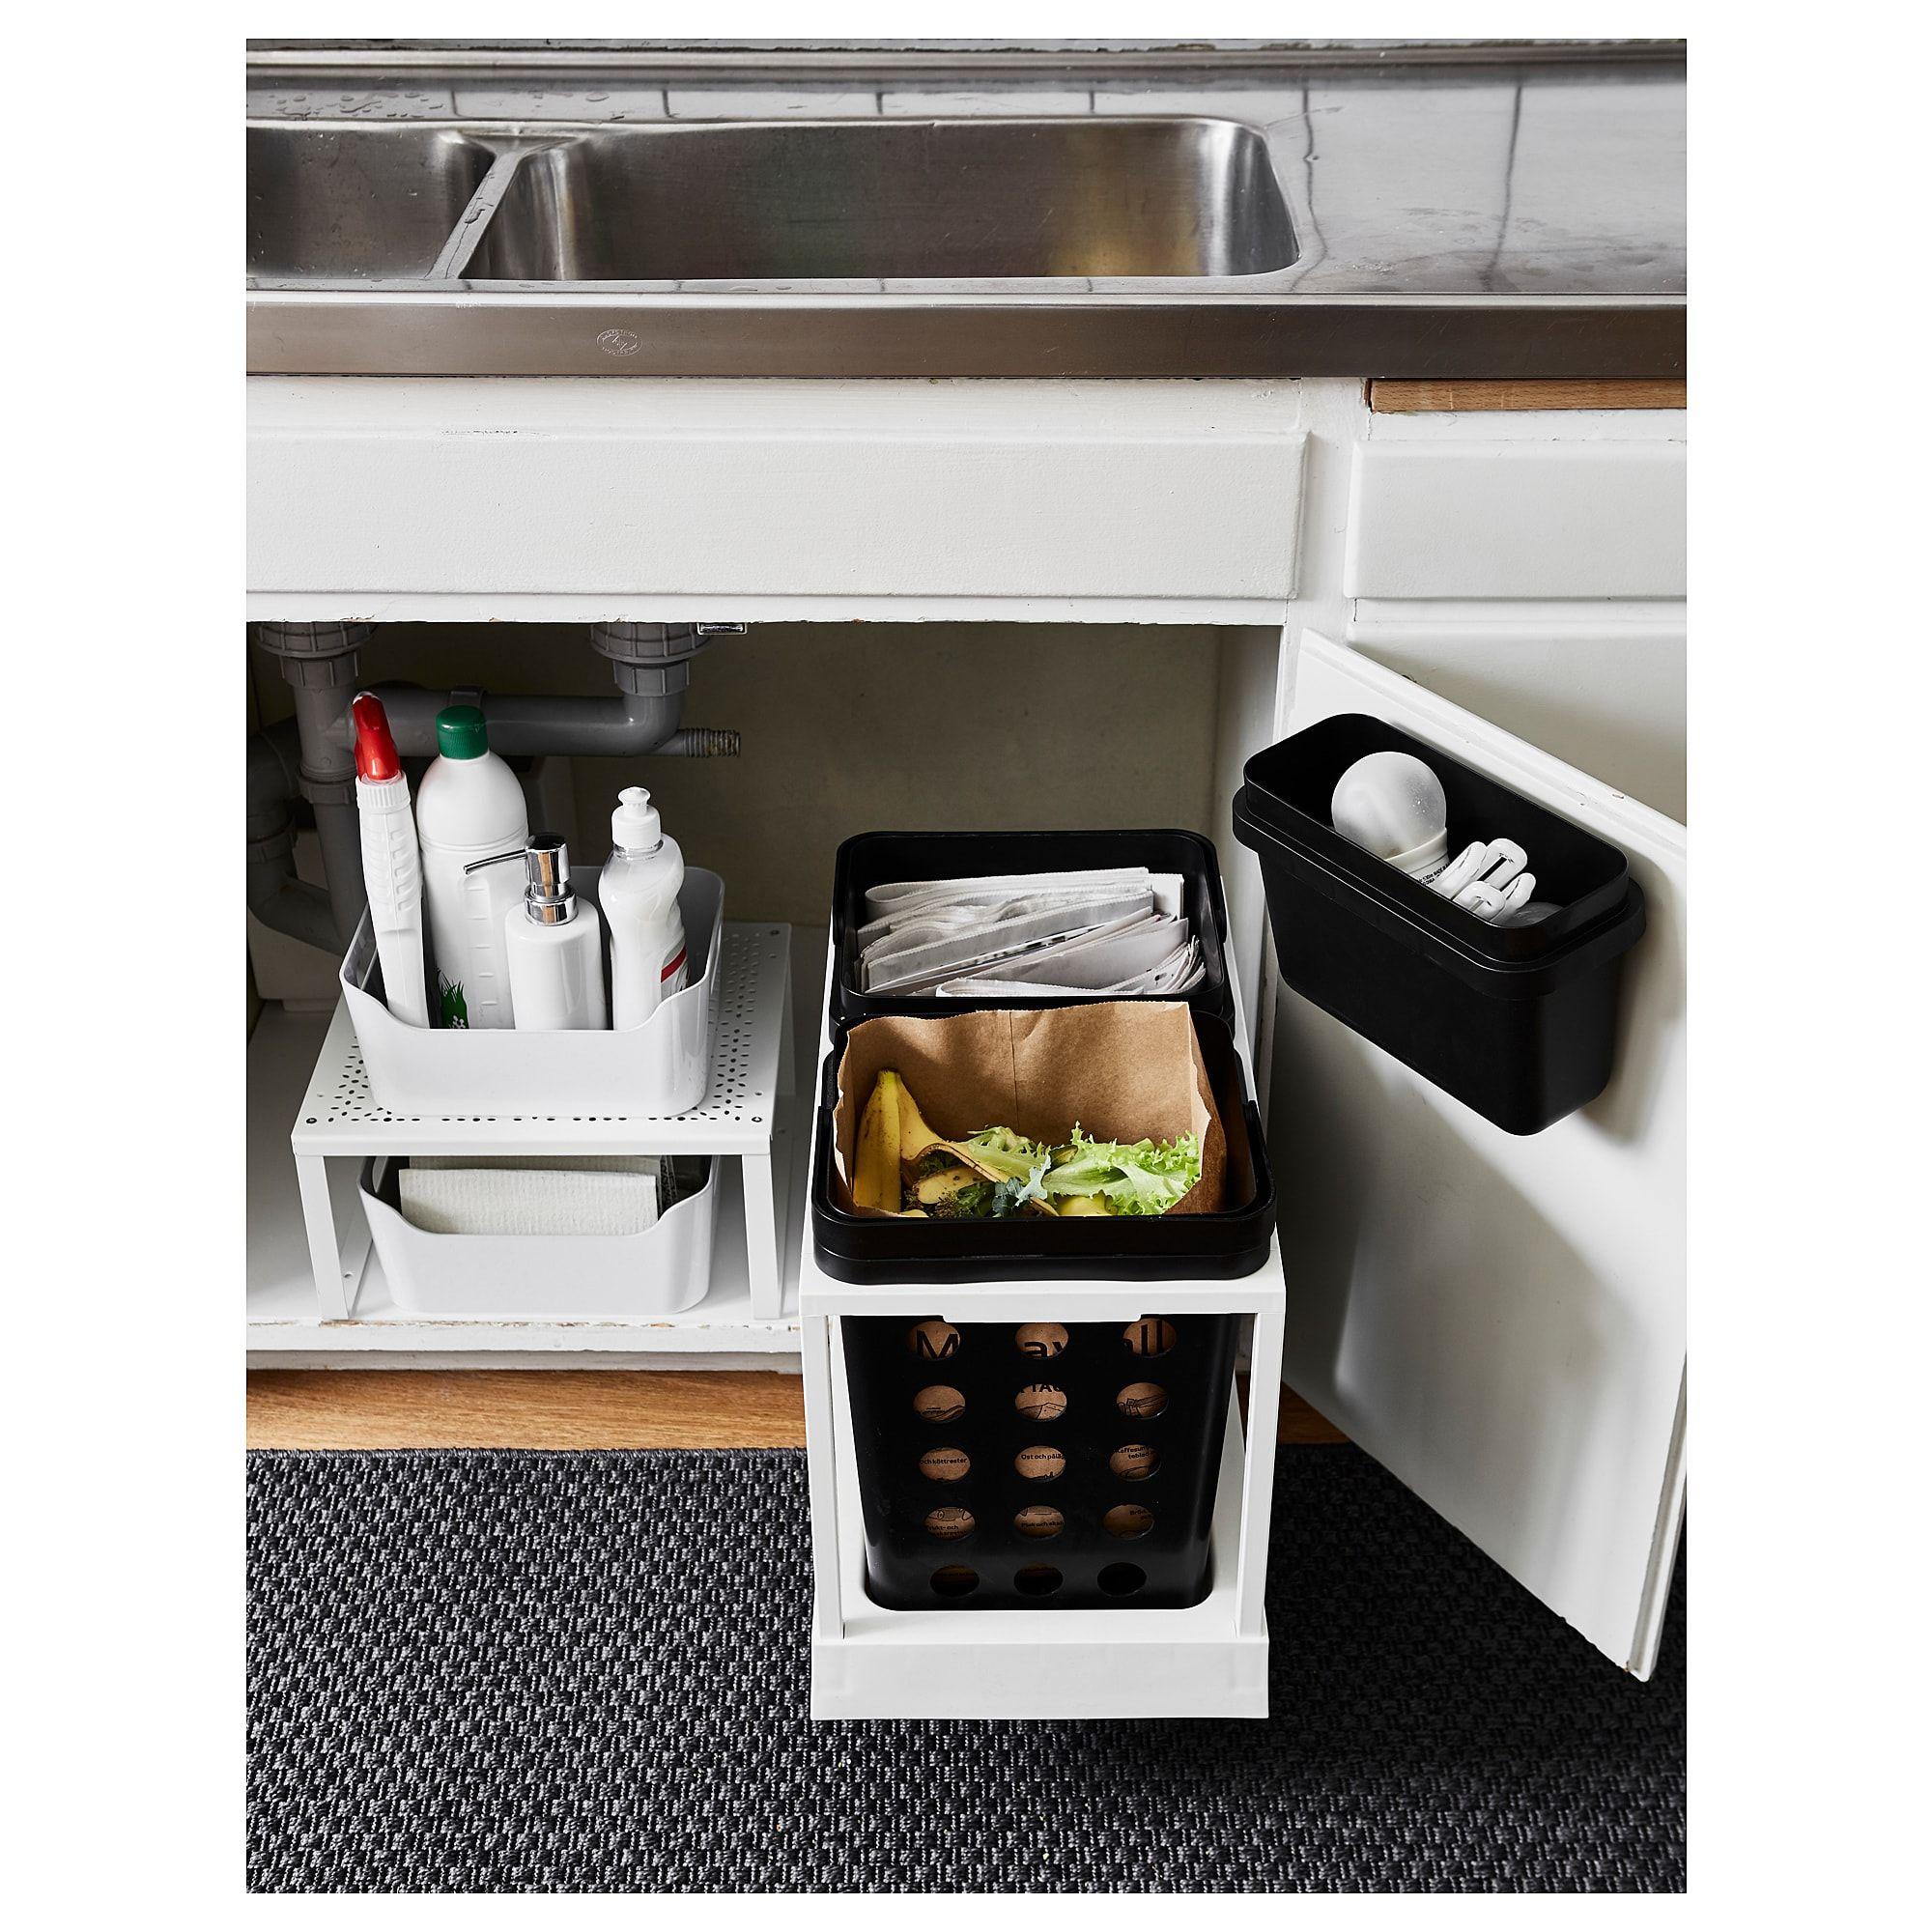 Accessori Per Lavelli Da Cucina.Ikea Moveis E Decoracao Nao Ha Casa Como A Nossa Organizzazione Lavello Cucina Idee Cucina Ikea Lavelli